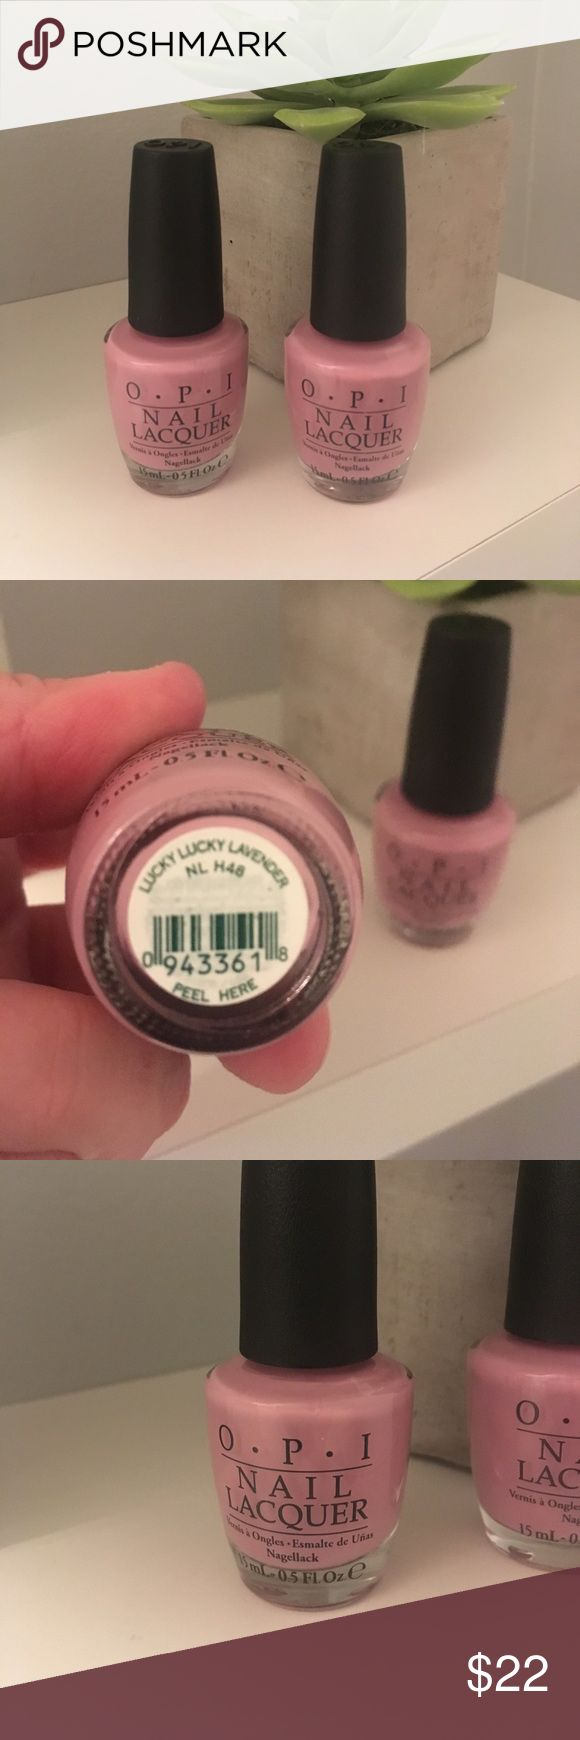 OPI New  Nail Polish 💅 Lucky Lucky Lavender Brand New 2 bottles of OPI nail Polish 💅 color Lucky Lucky Lavender opi Makeup